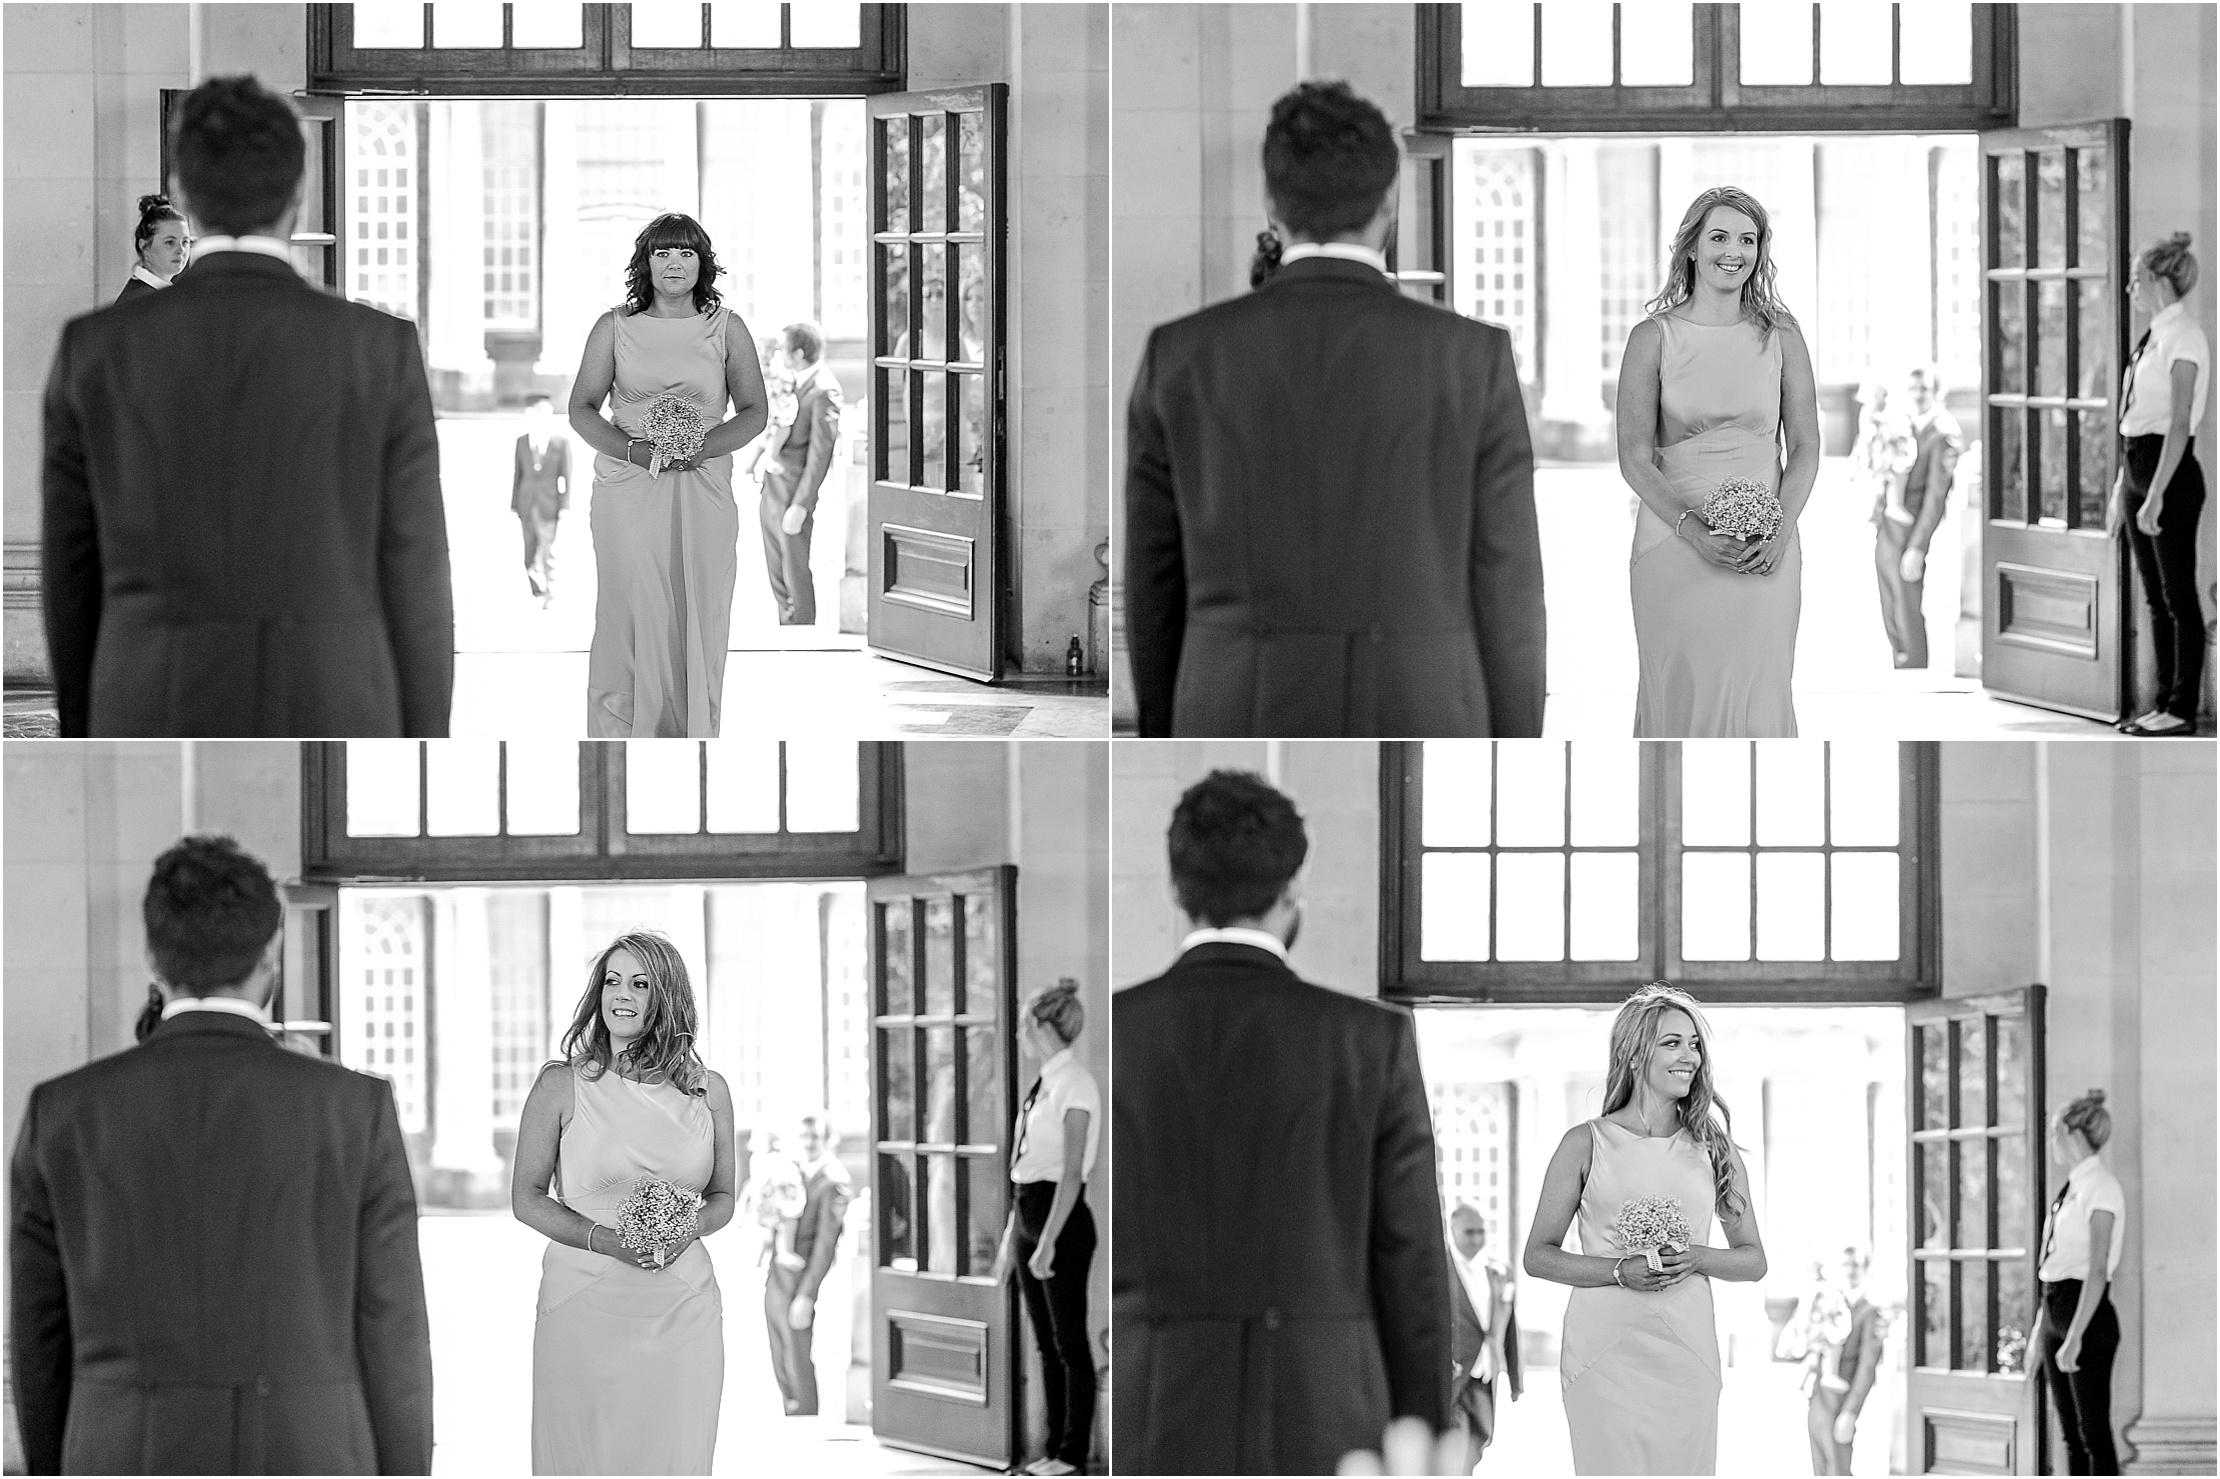 staining-lodge-wedding-050.jpg